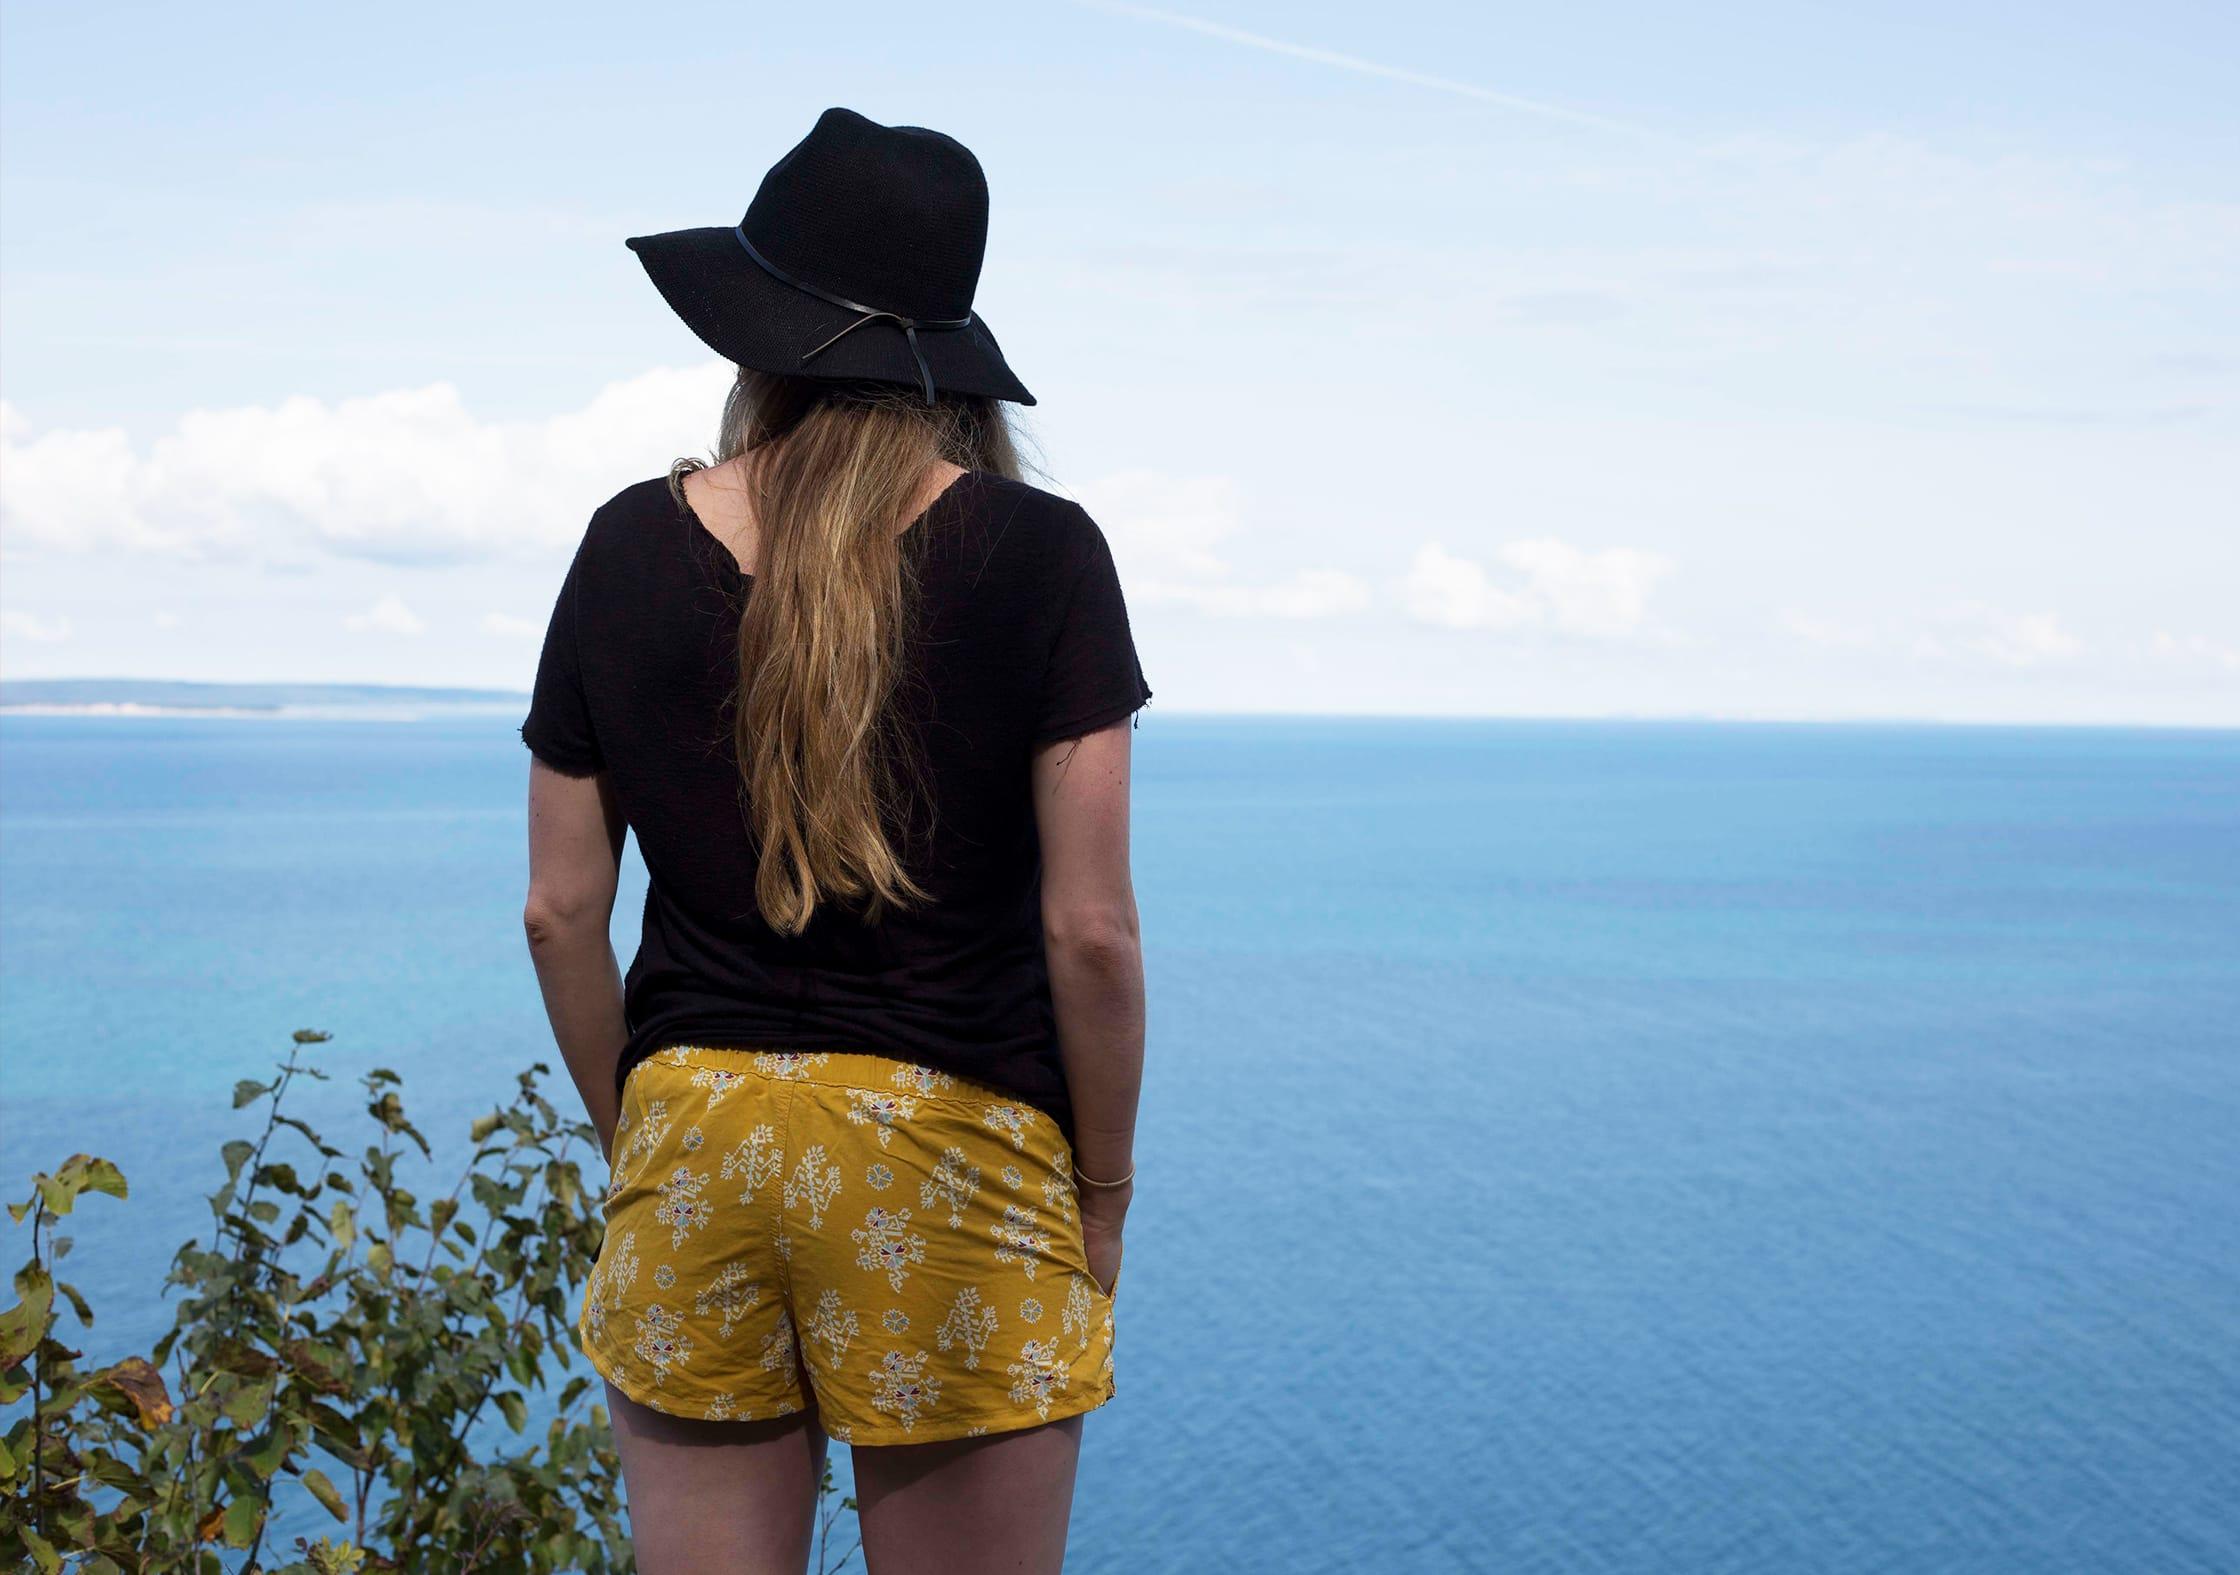 Patagonia Women's Barely Baggies™ Shorts at Sleeping Bear Dunes National Lakeshore